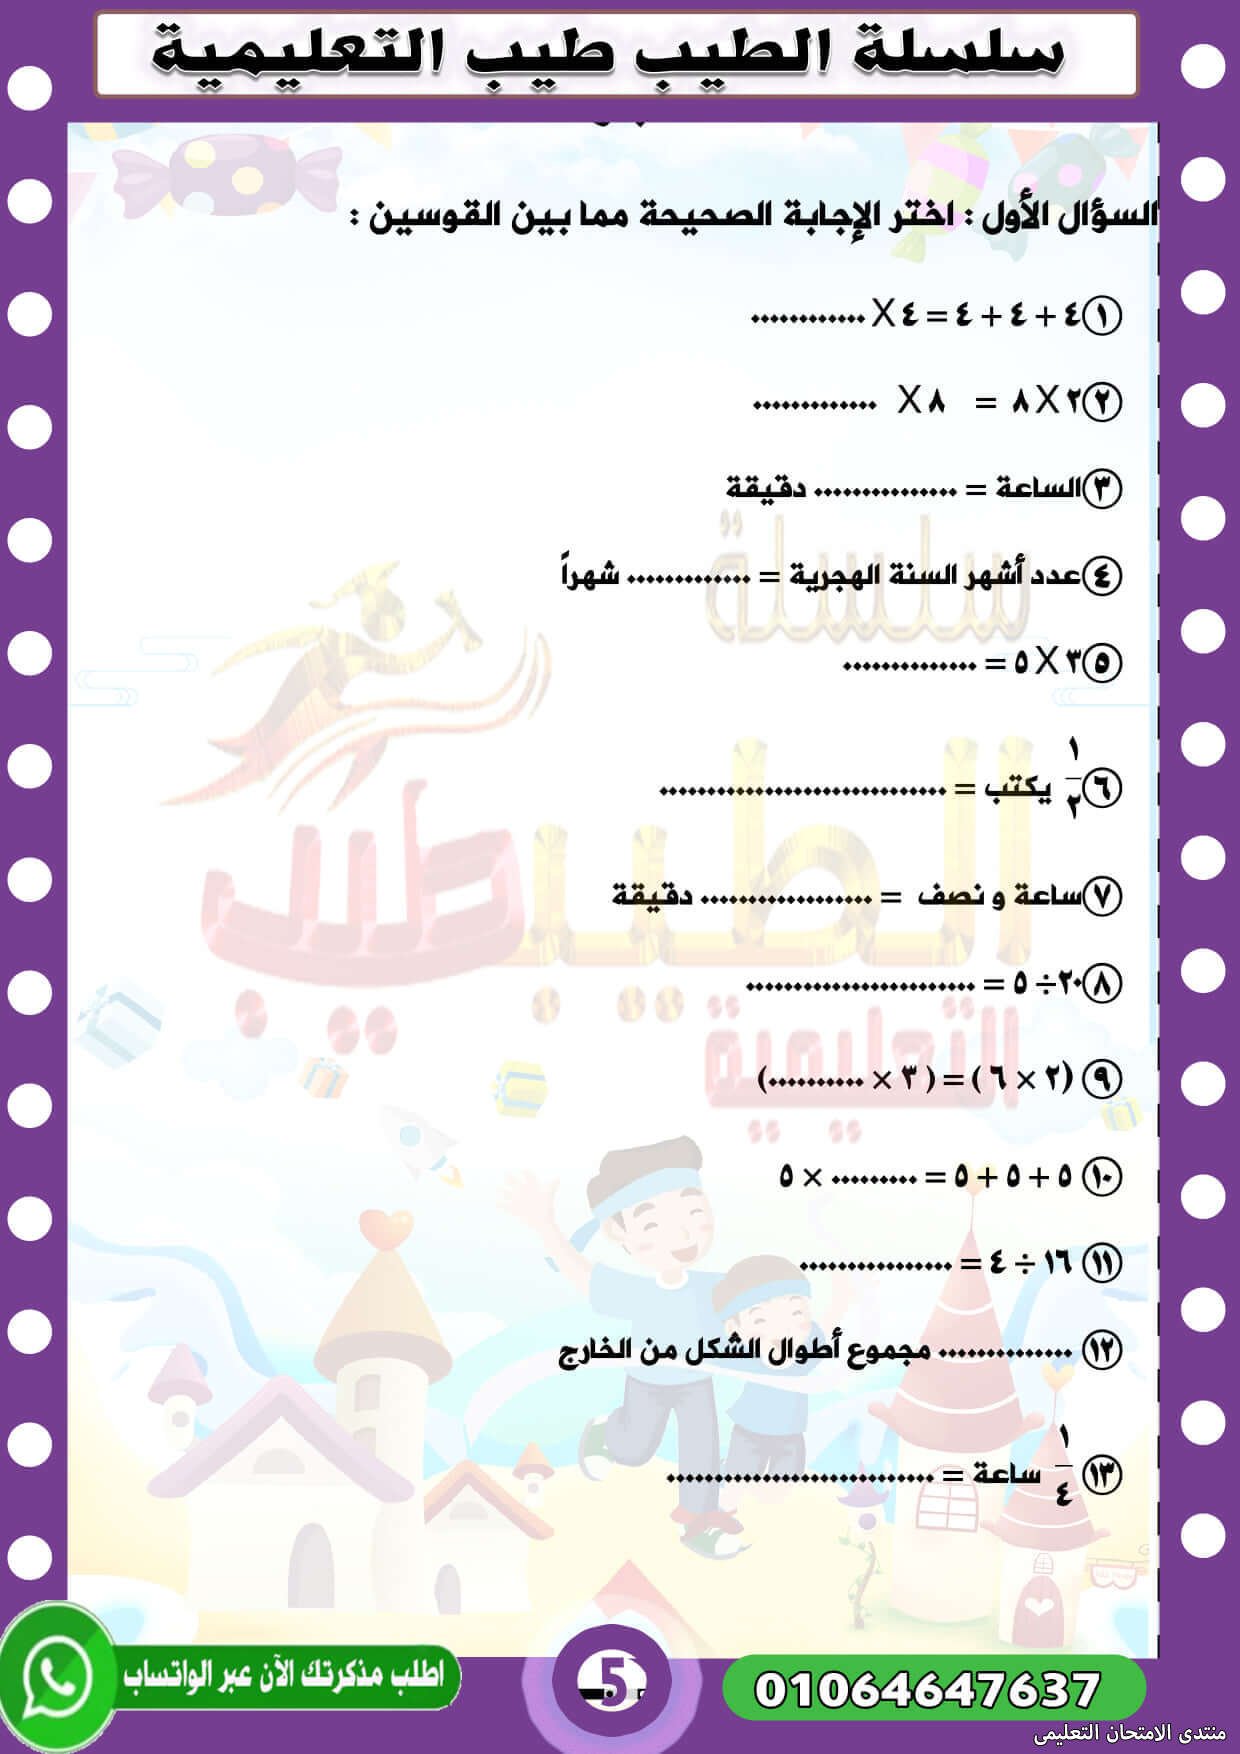 exam-eg.com_161835691810325.jpg